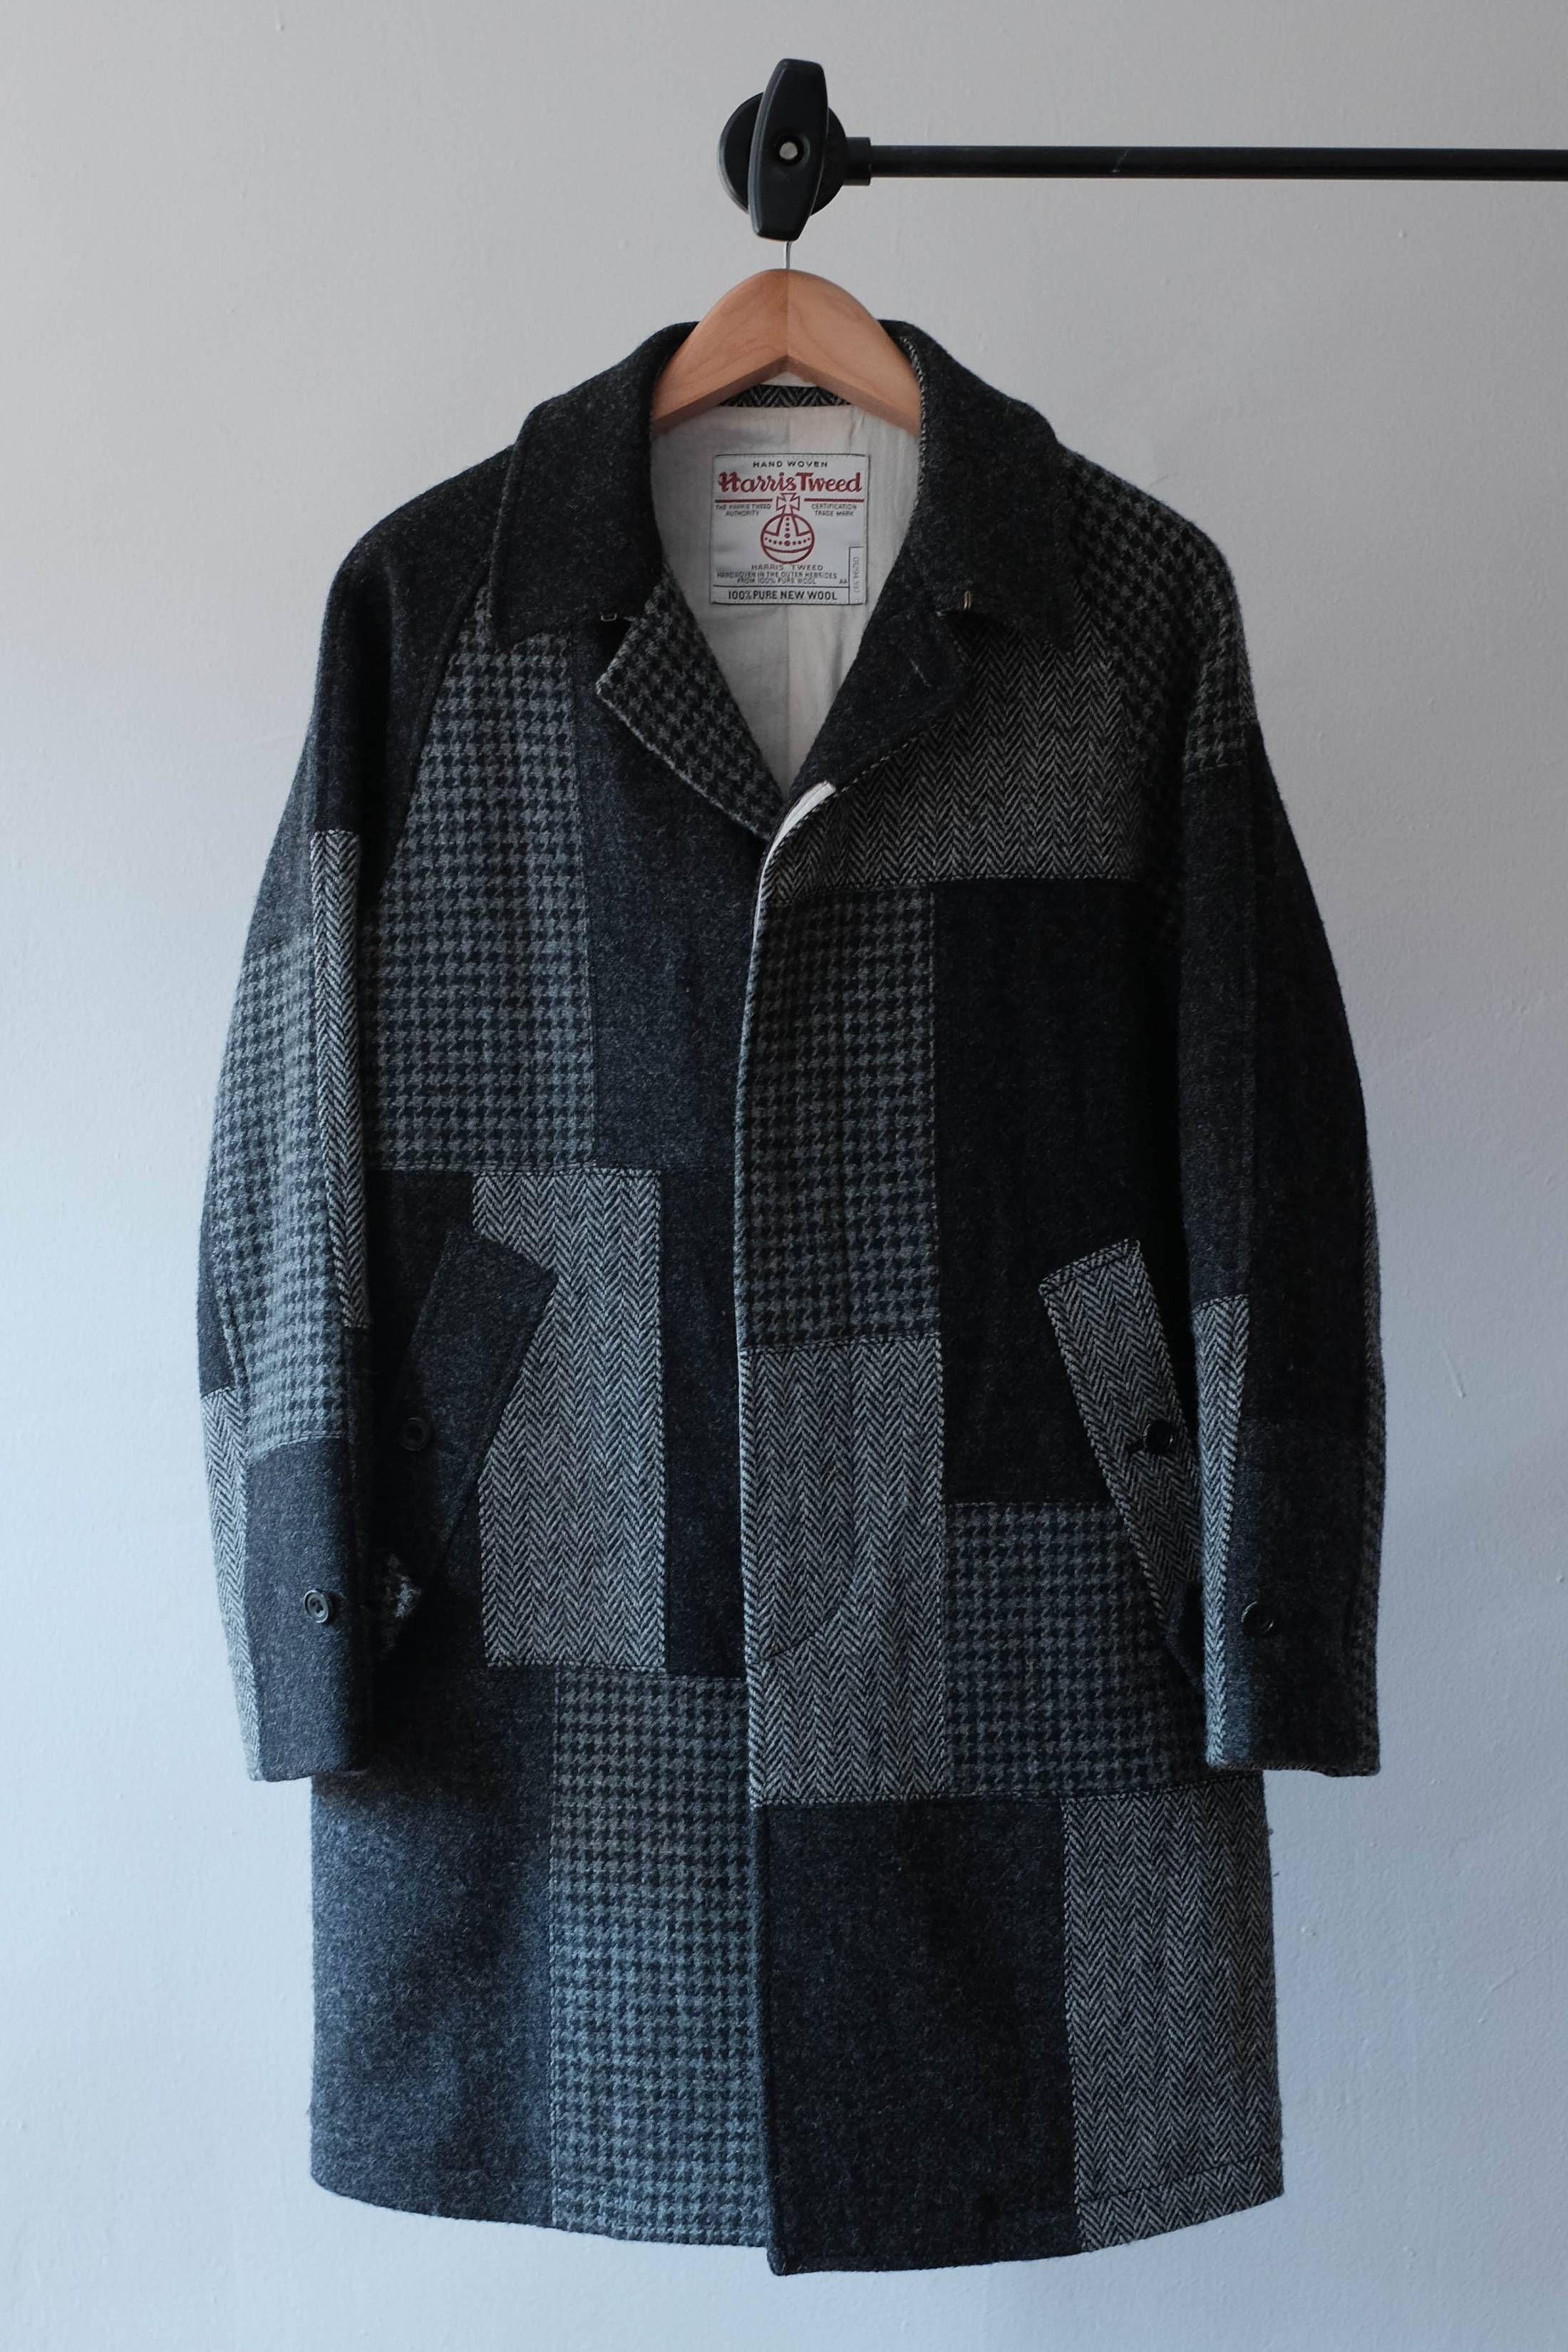 e37c3efb6d60c3 Beams Plus Harris Tweed Patchwork Coat Size US S   EU 44-46   1